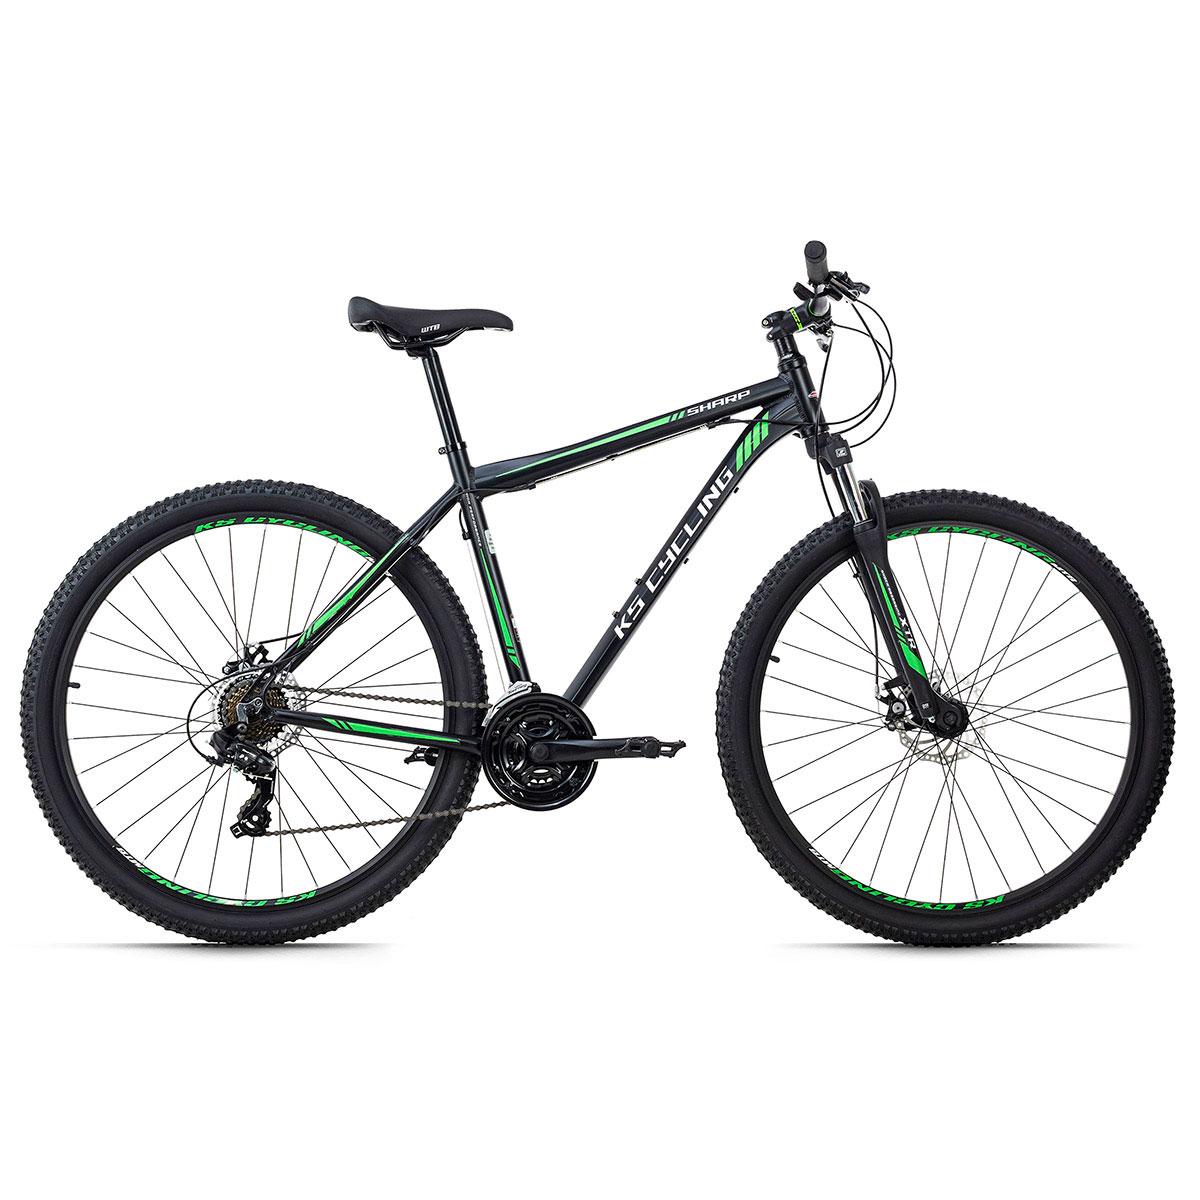 "Mountainbike ""Sharp"", Hardtail, 29 Zoll, 21 Gänge, schwarz-grün 21 | schwarz-grün | 29 Zoll"